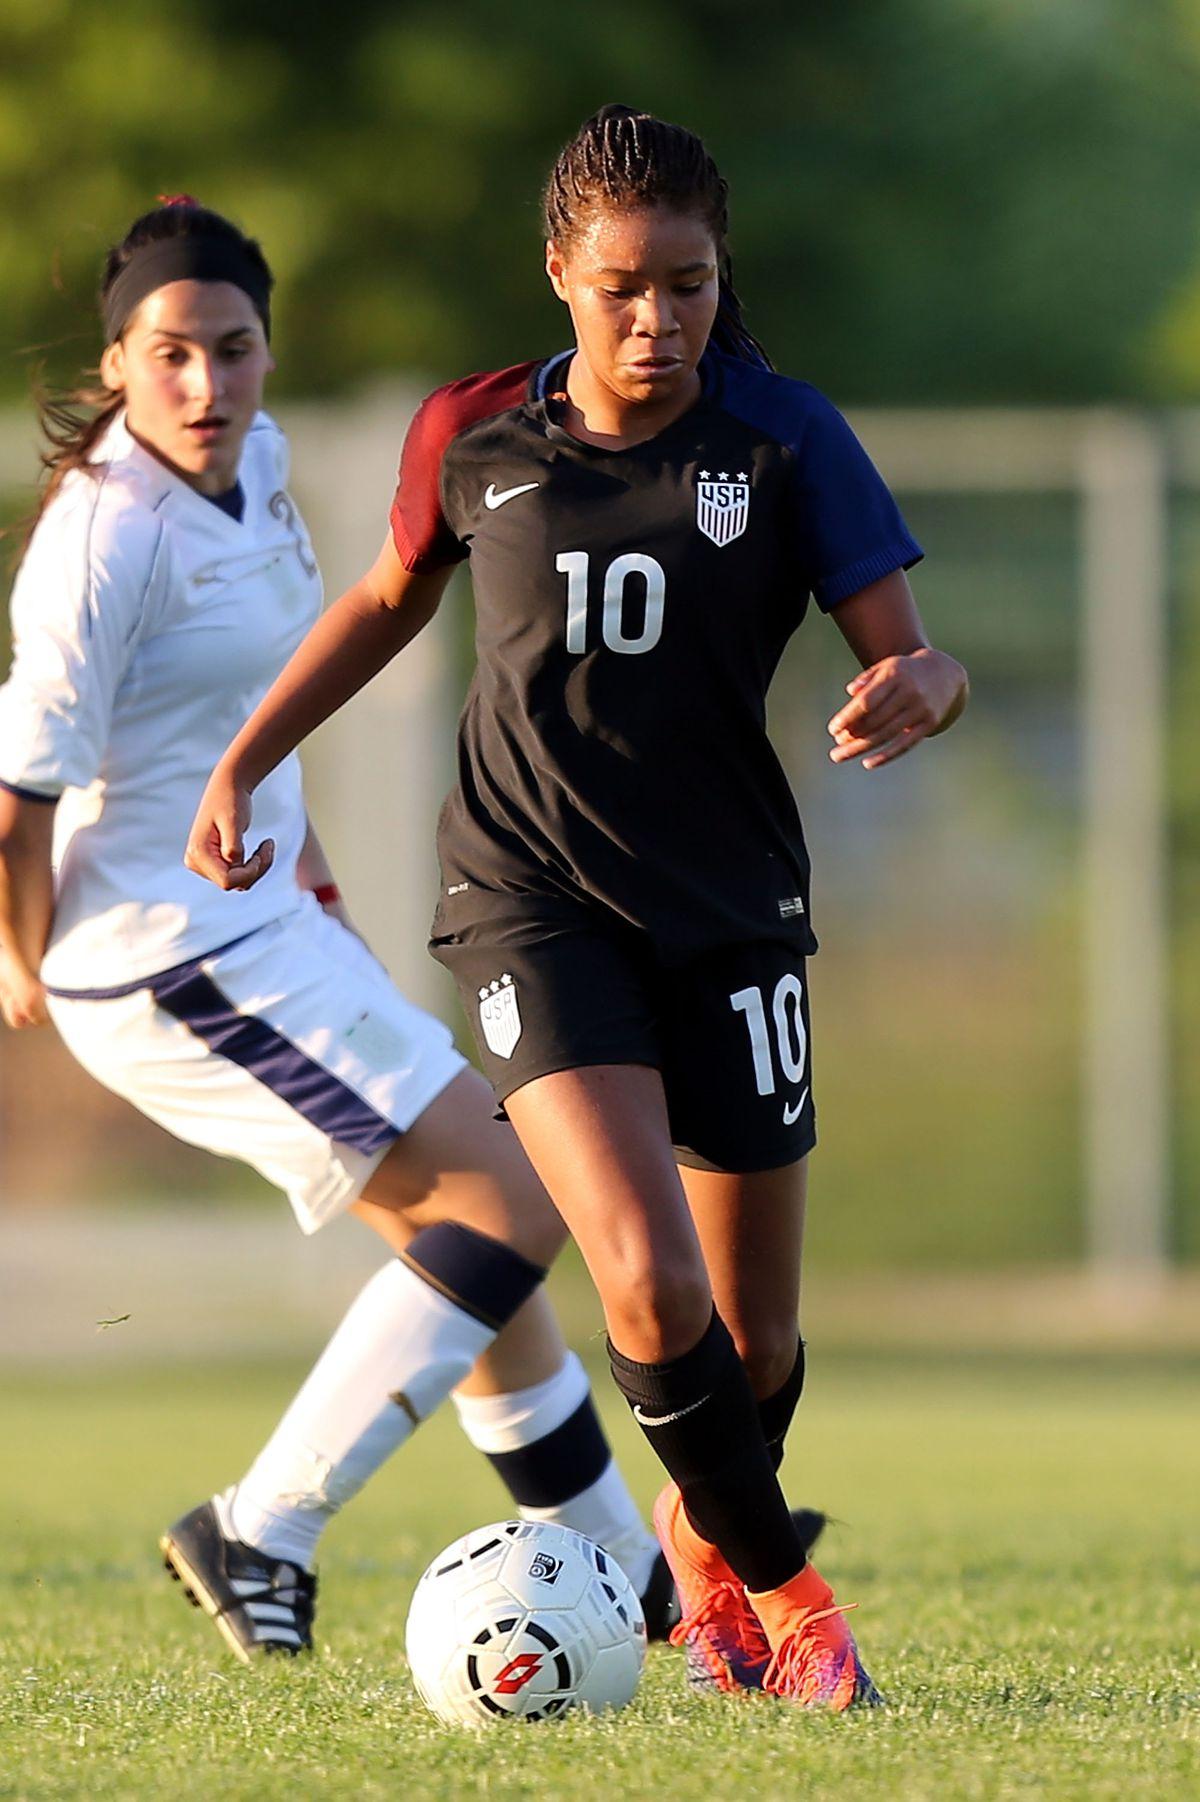 Italy U16 v USA U16 - 2nd Female Tournament 'Delle Nazioni' Final